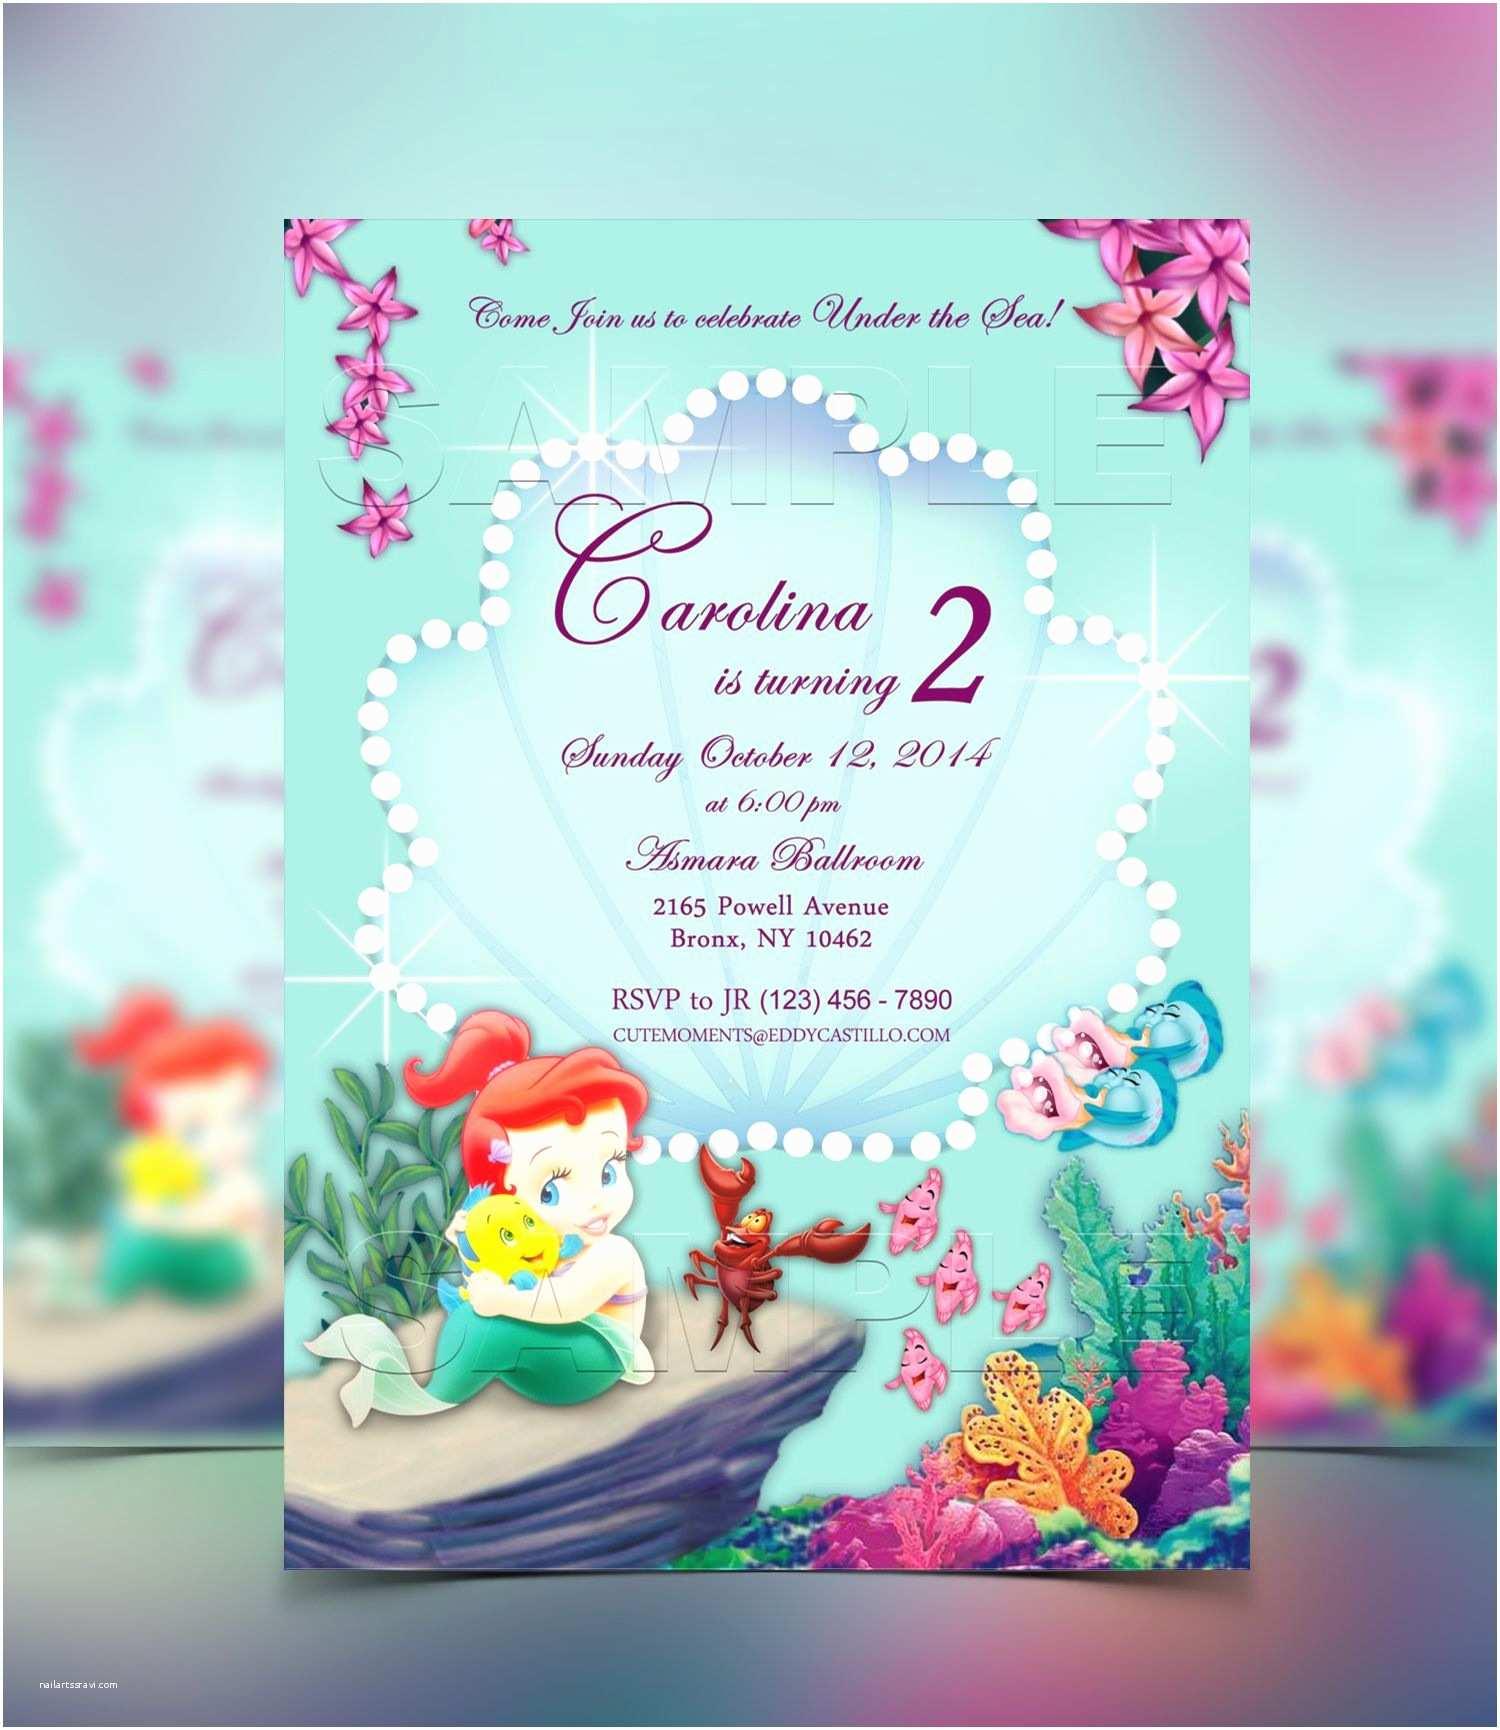 Mermaid Birthday Party Invitations the Little Mermaid Invitation Birthday